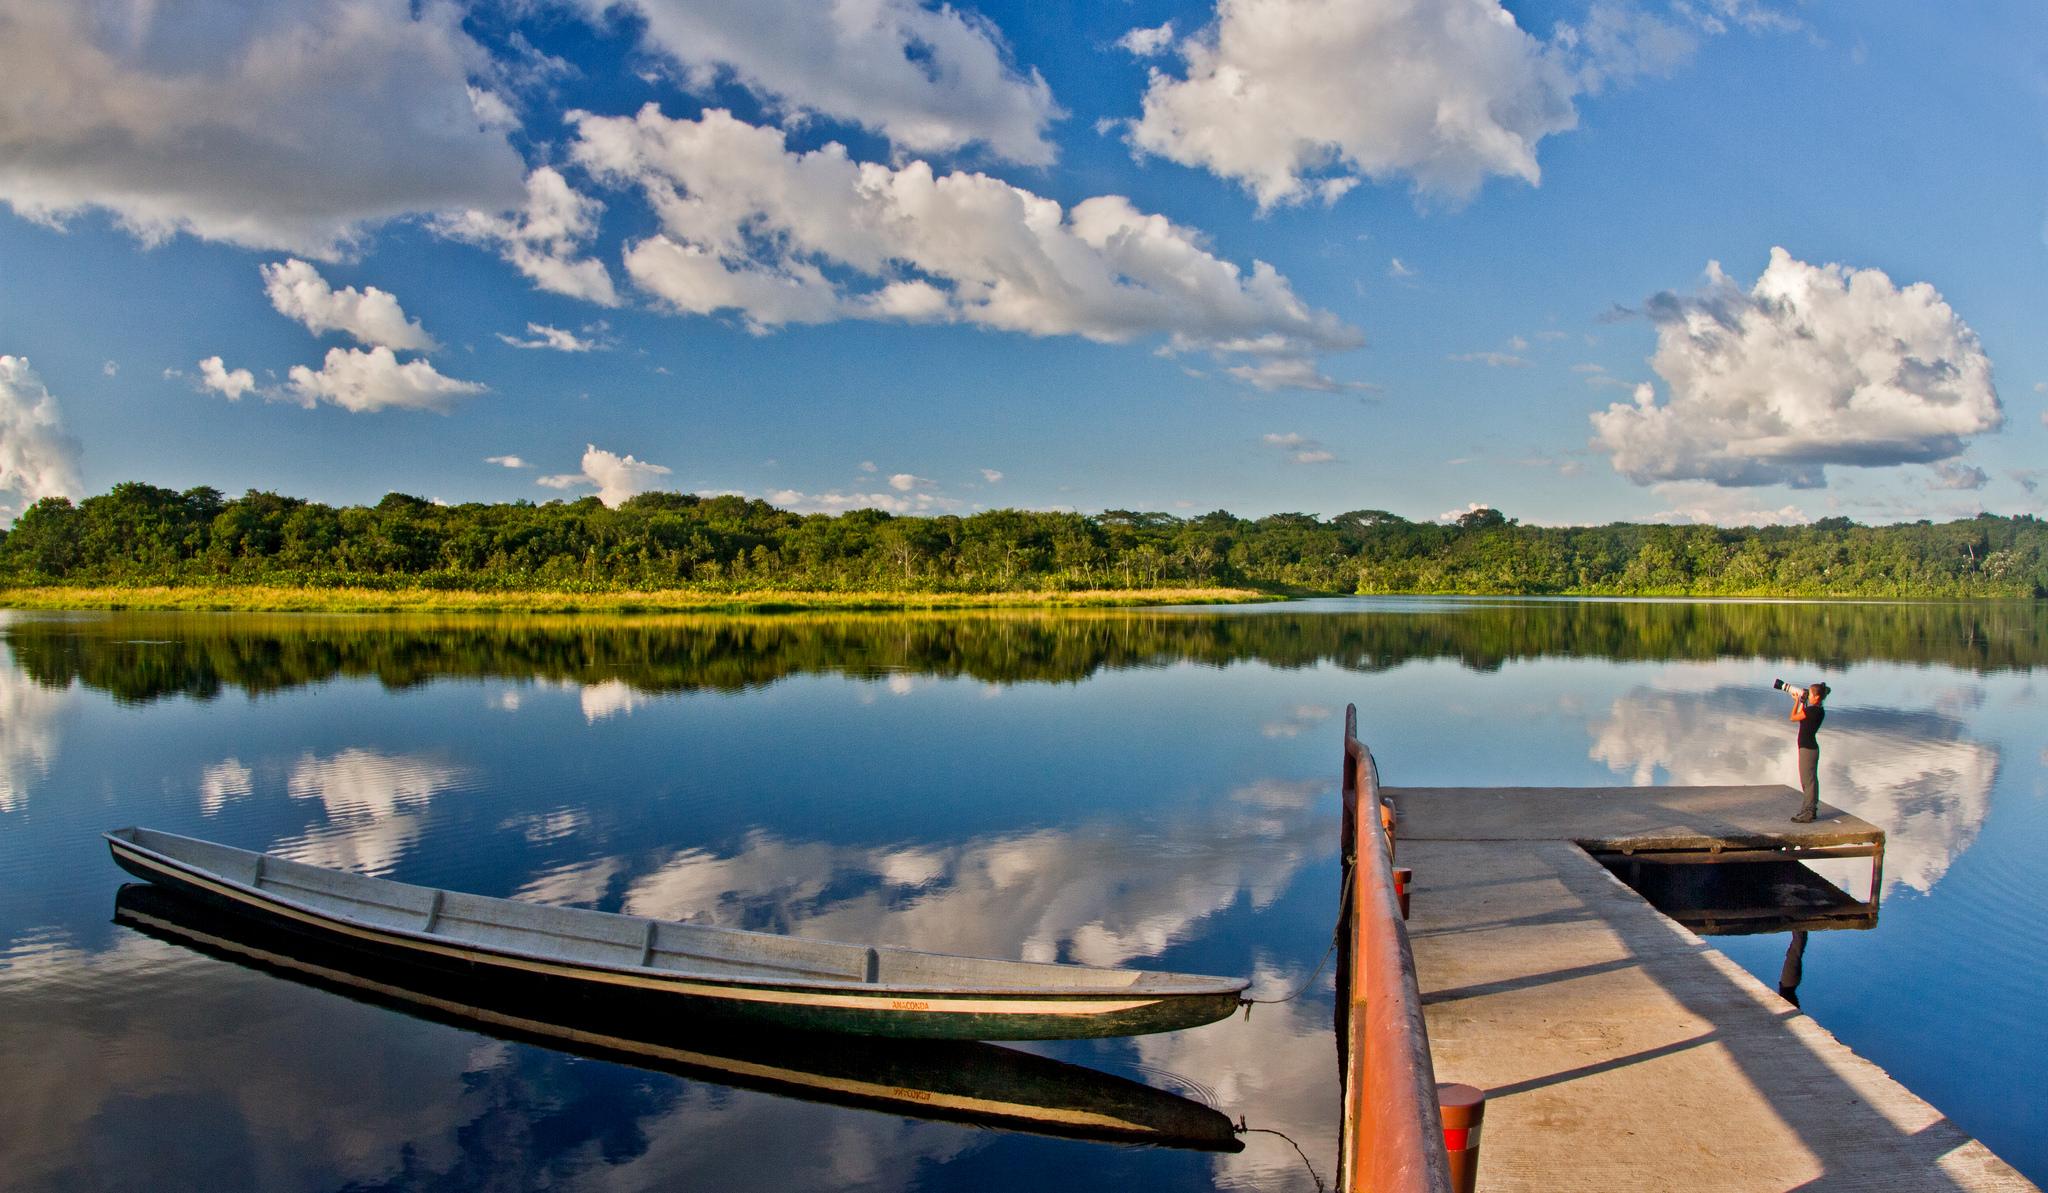 The Napo River, part of the Amazon basin.